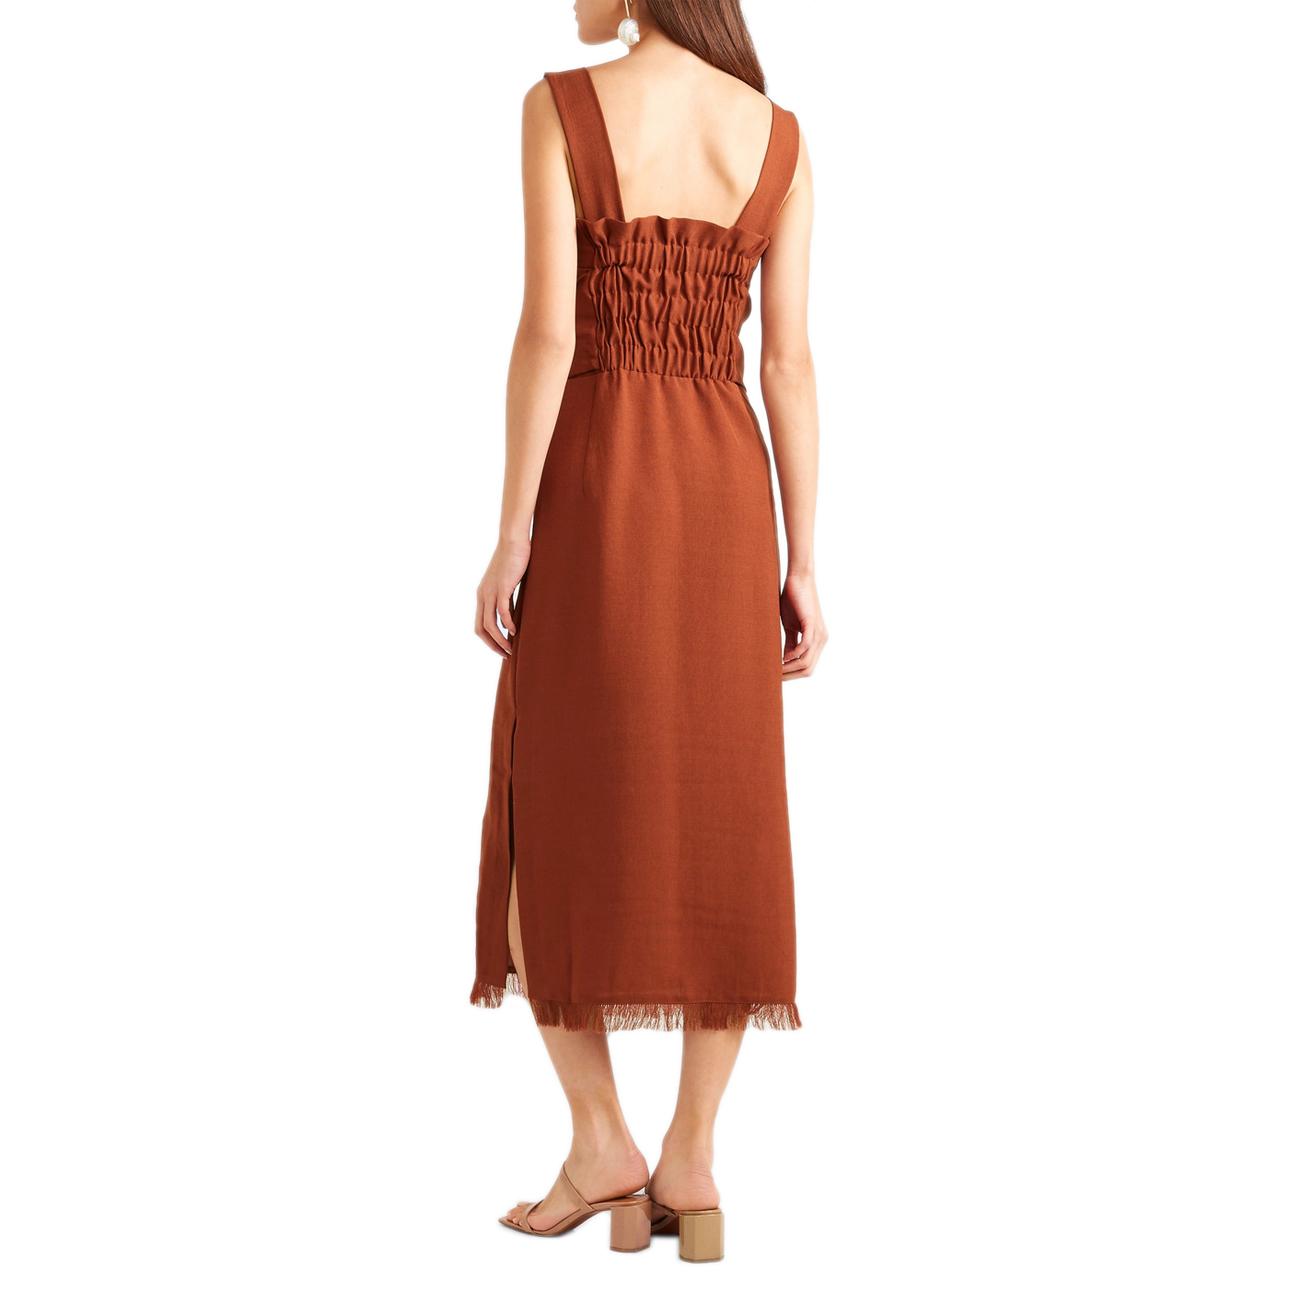 NANUSHKA Riley Tie-Front Button Down Midi Dress with Fringe In Brick